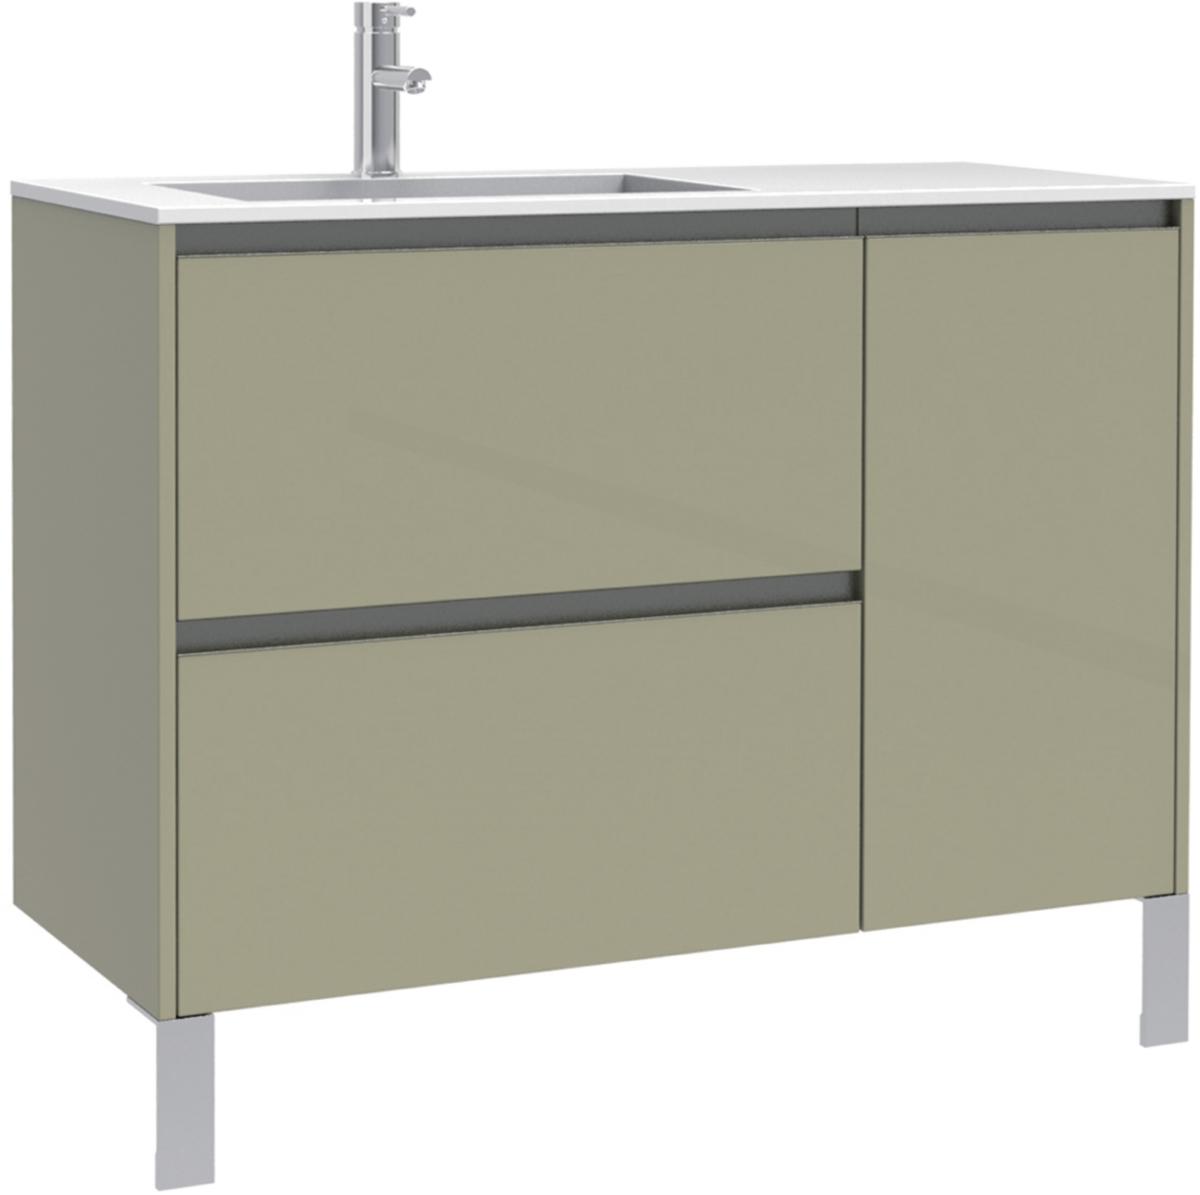 Meuble sous vasque plenitude 105cm 2 tiroirs 1 porte pour for Porte pour meuble salle de bain